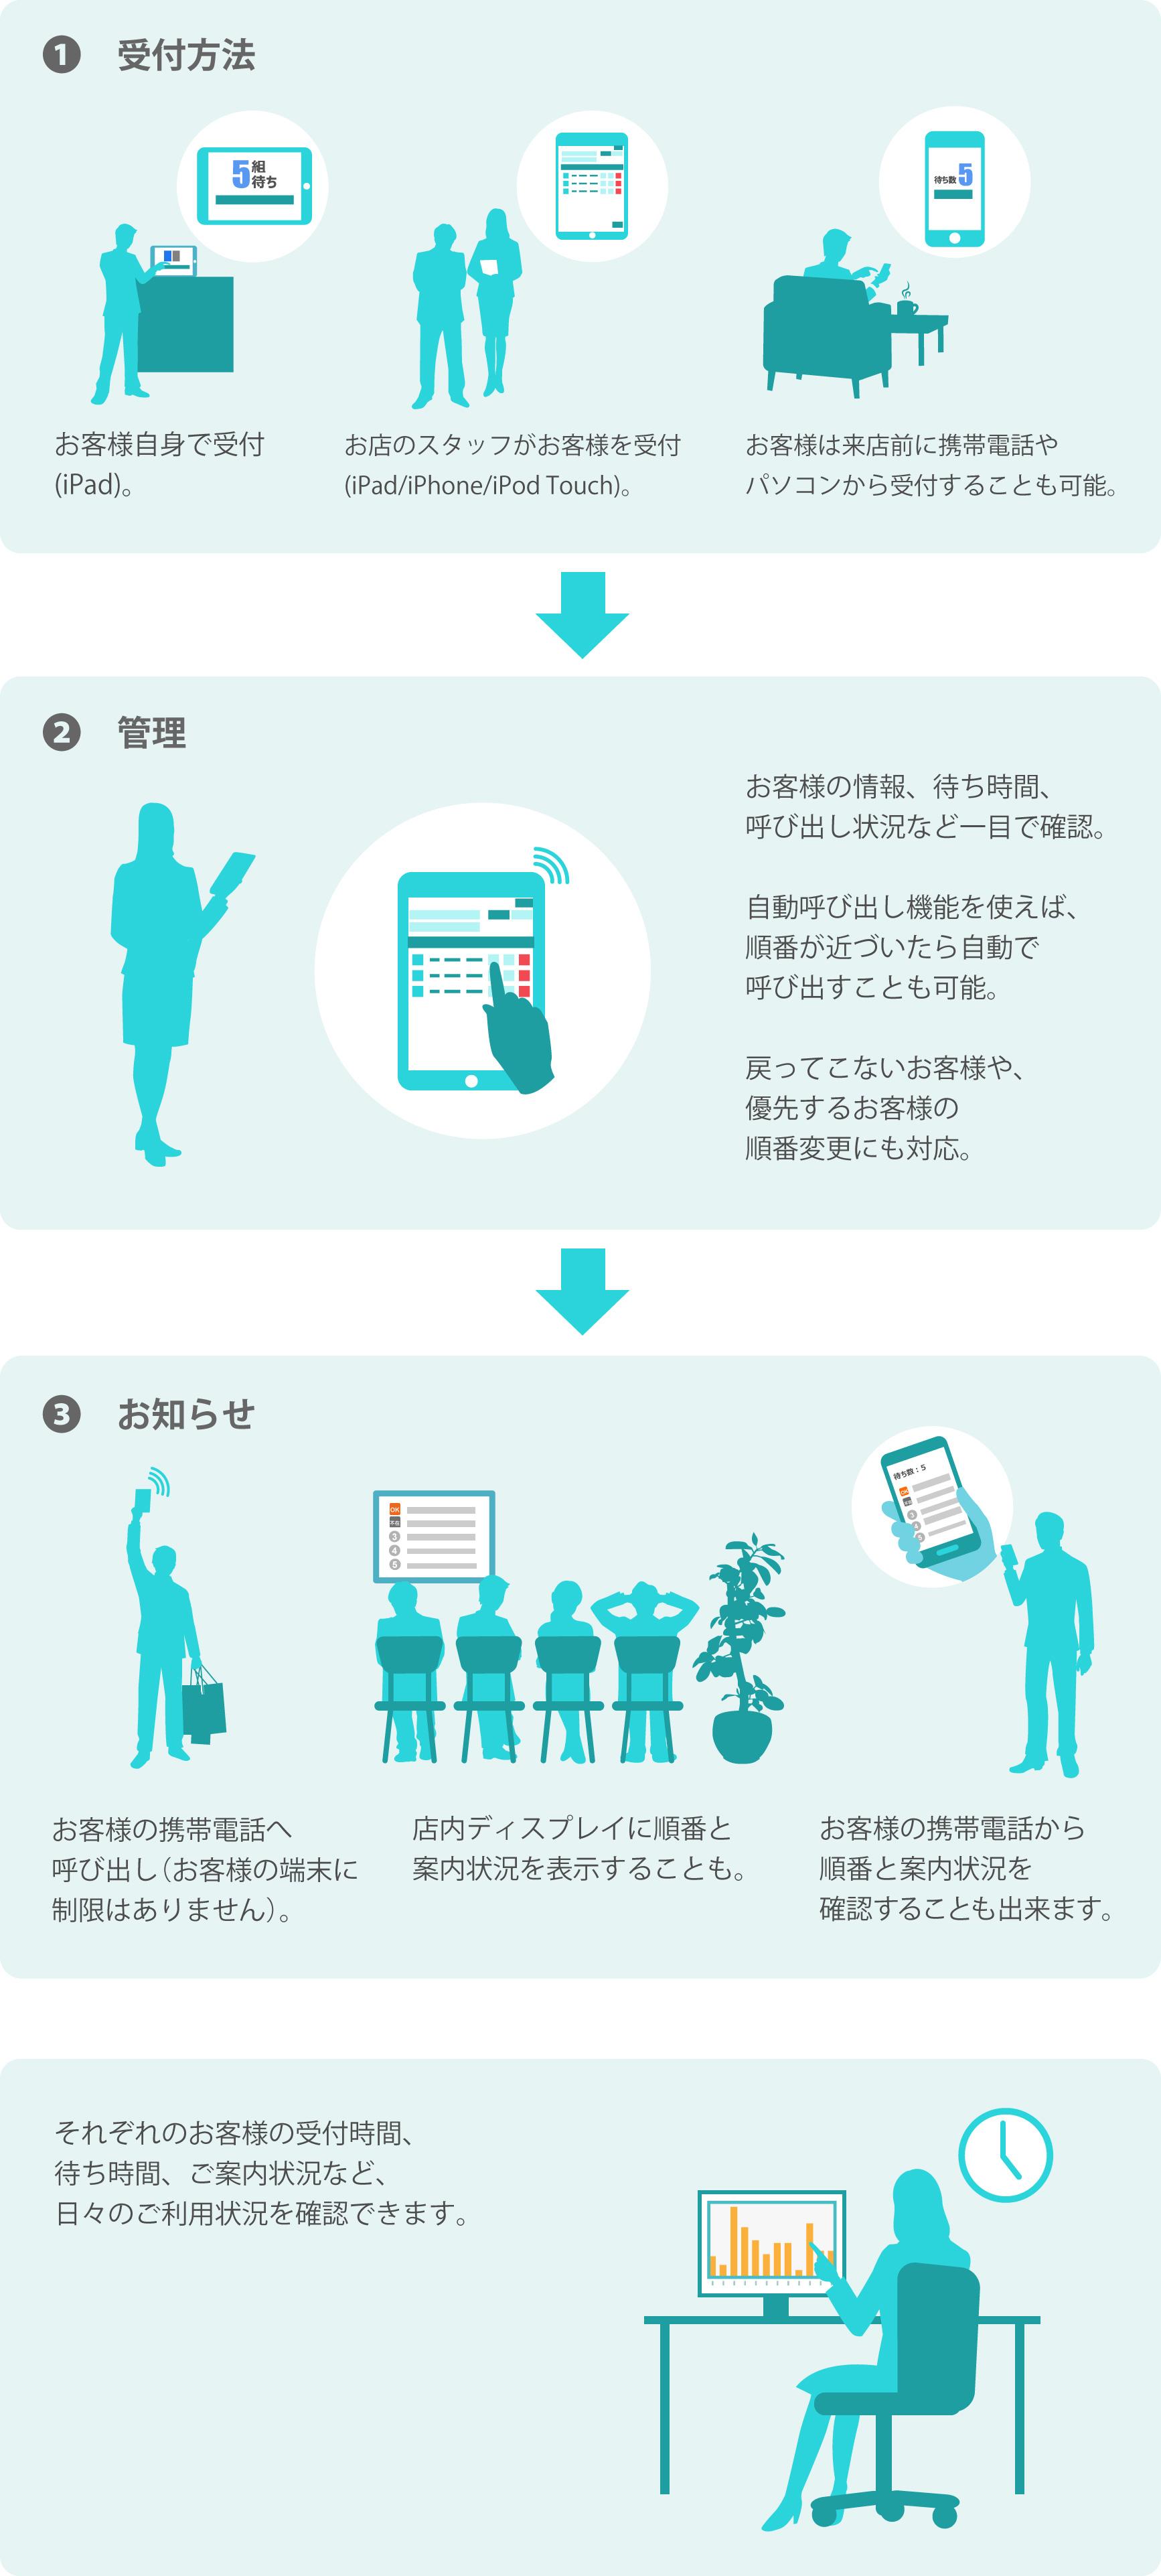 myjunban-use case image 利用方法